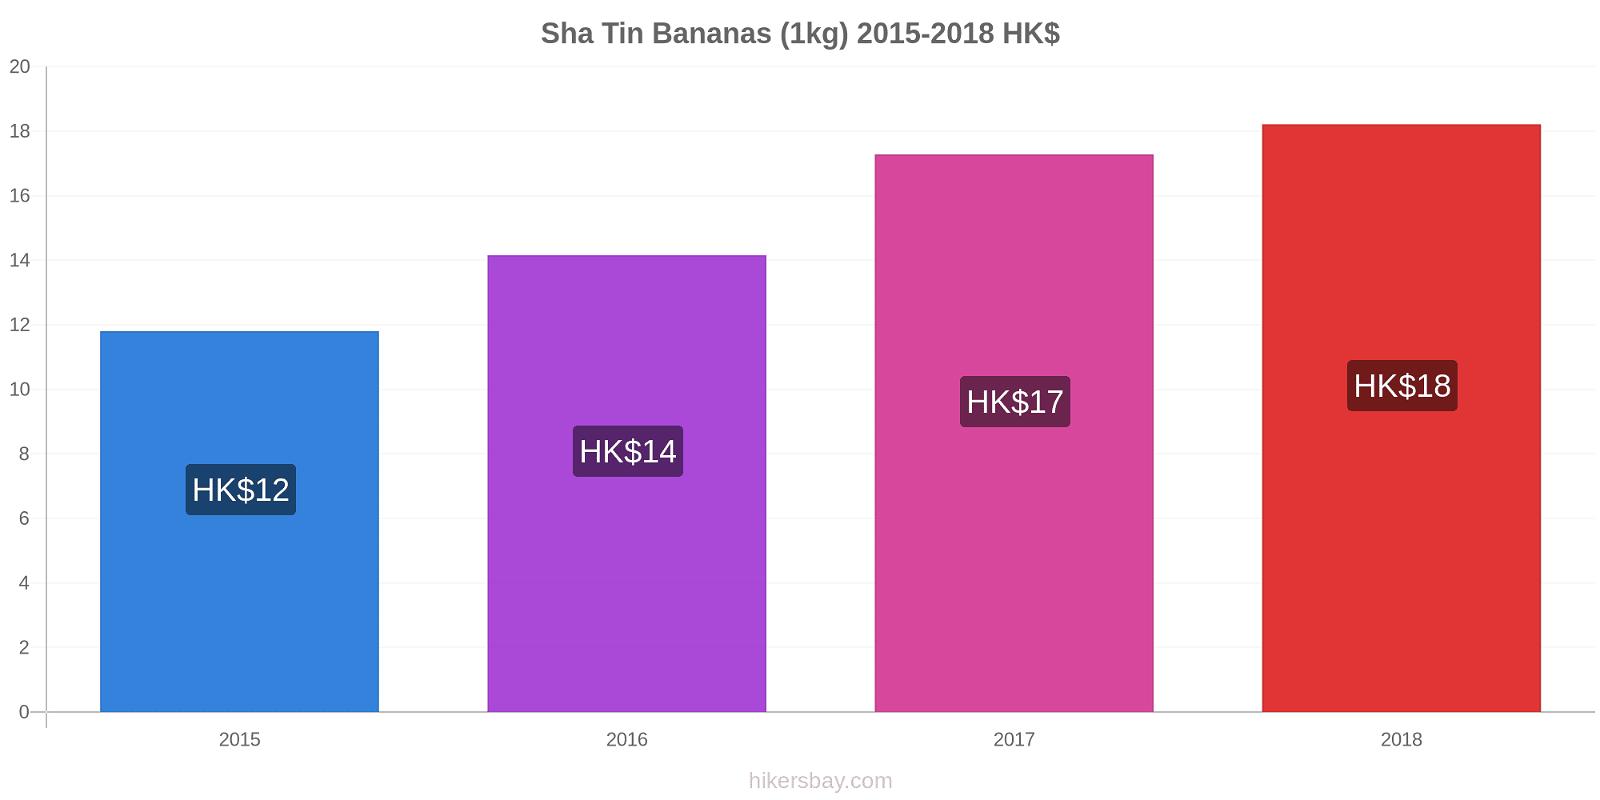 Sha Tin price changes Bananas (1kg) hikersbay.com